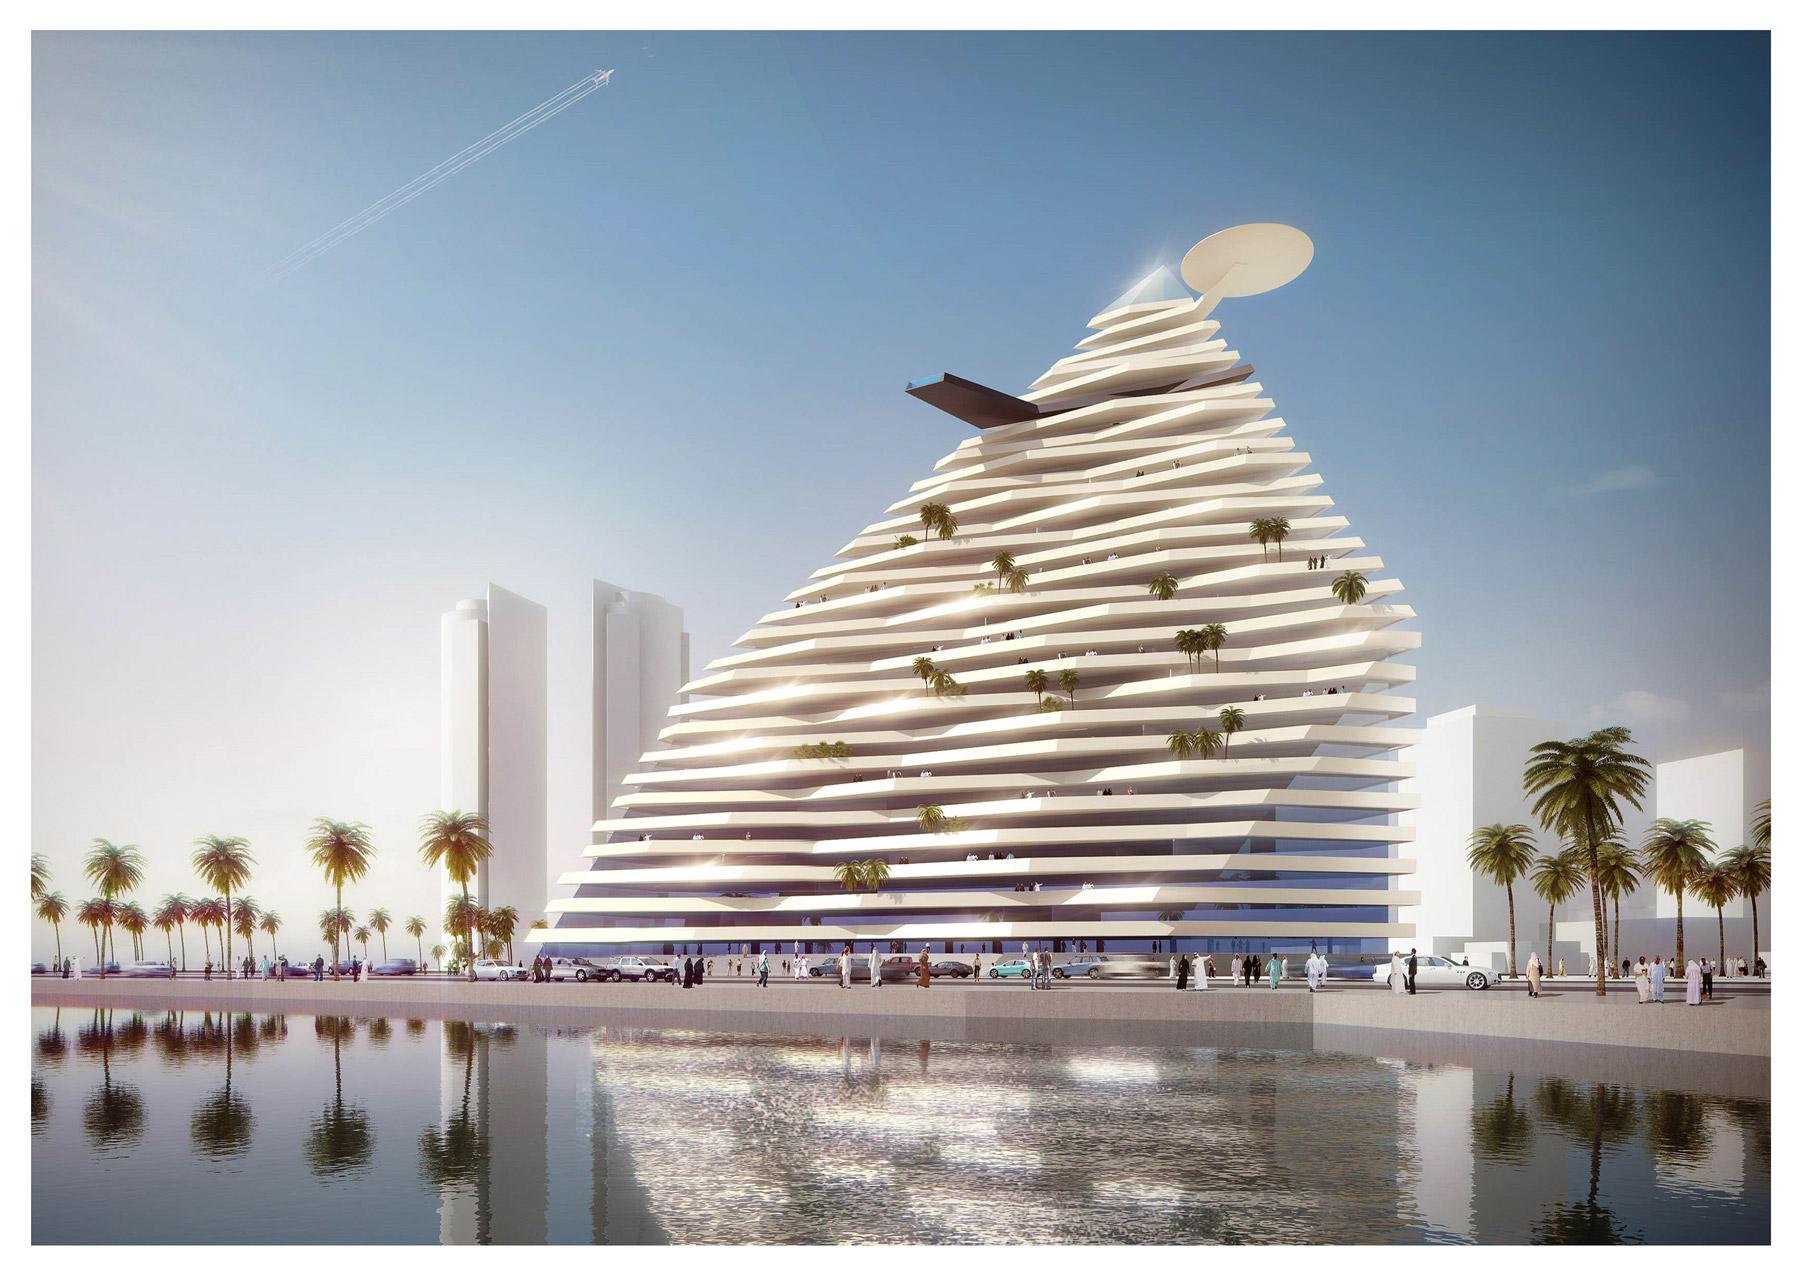 160_Qatar_Corniche_Slide_01